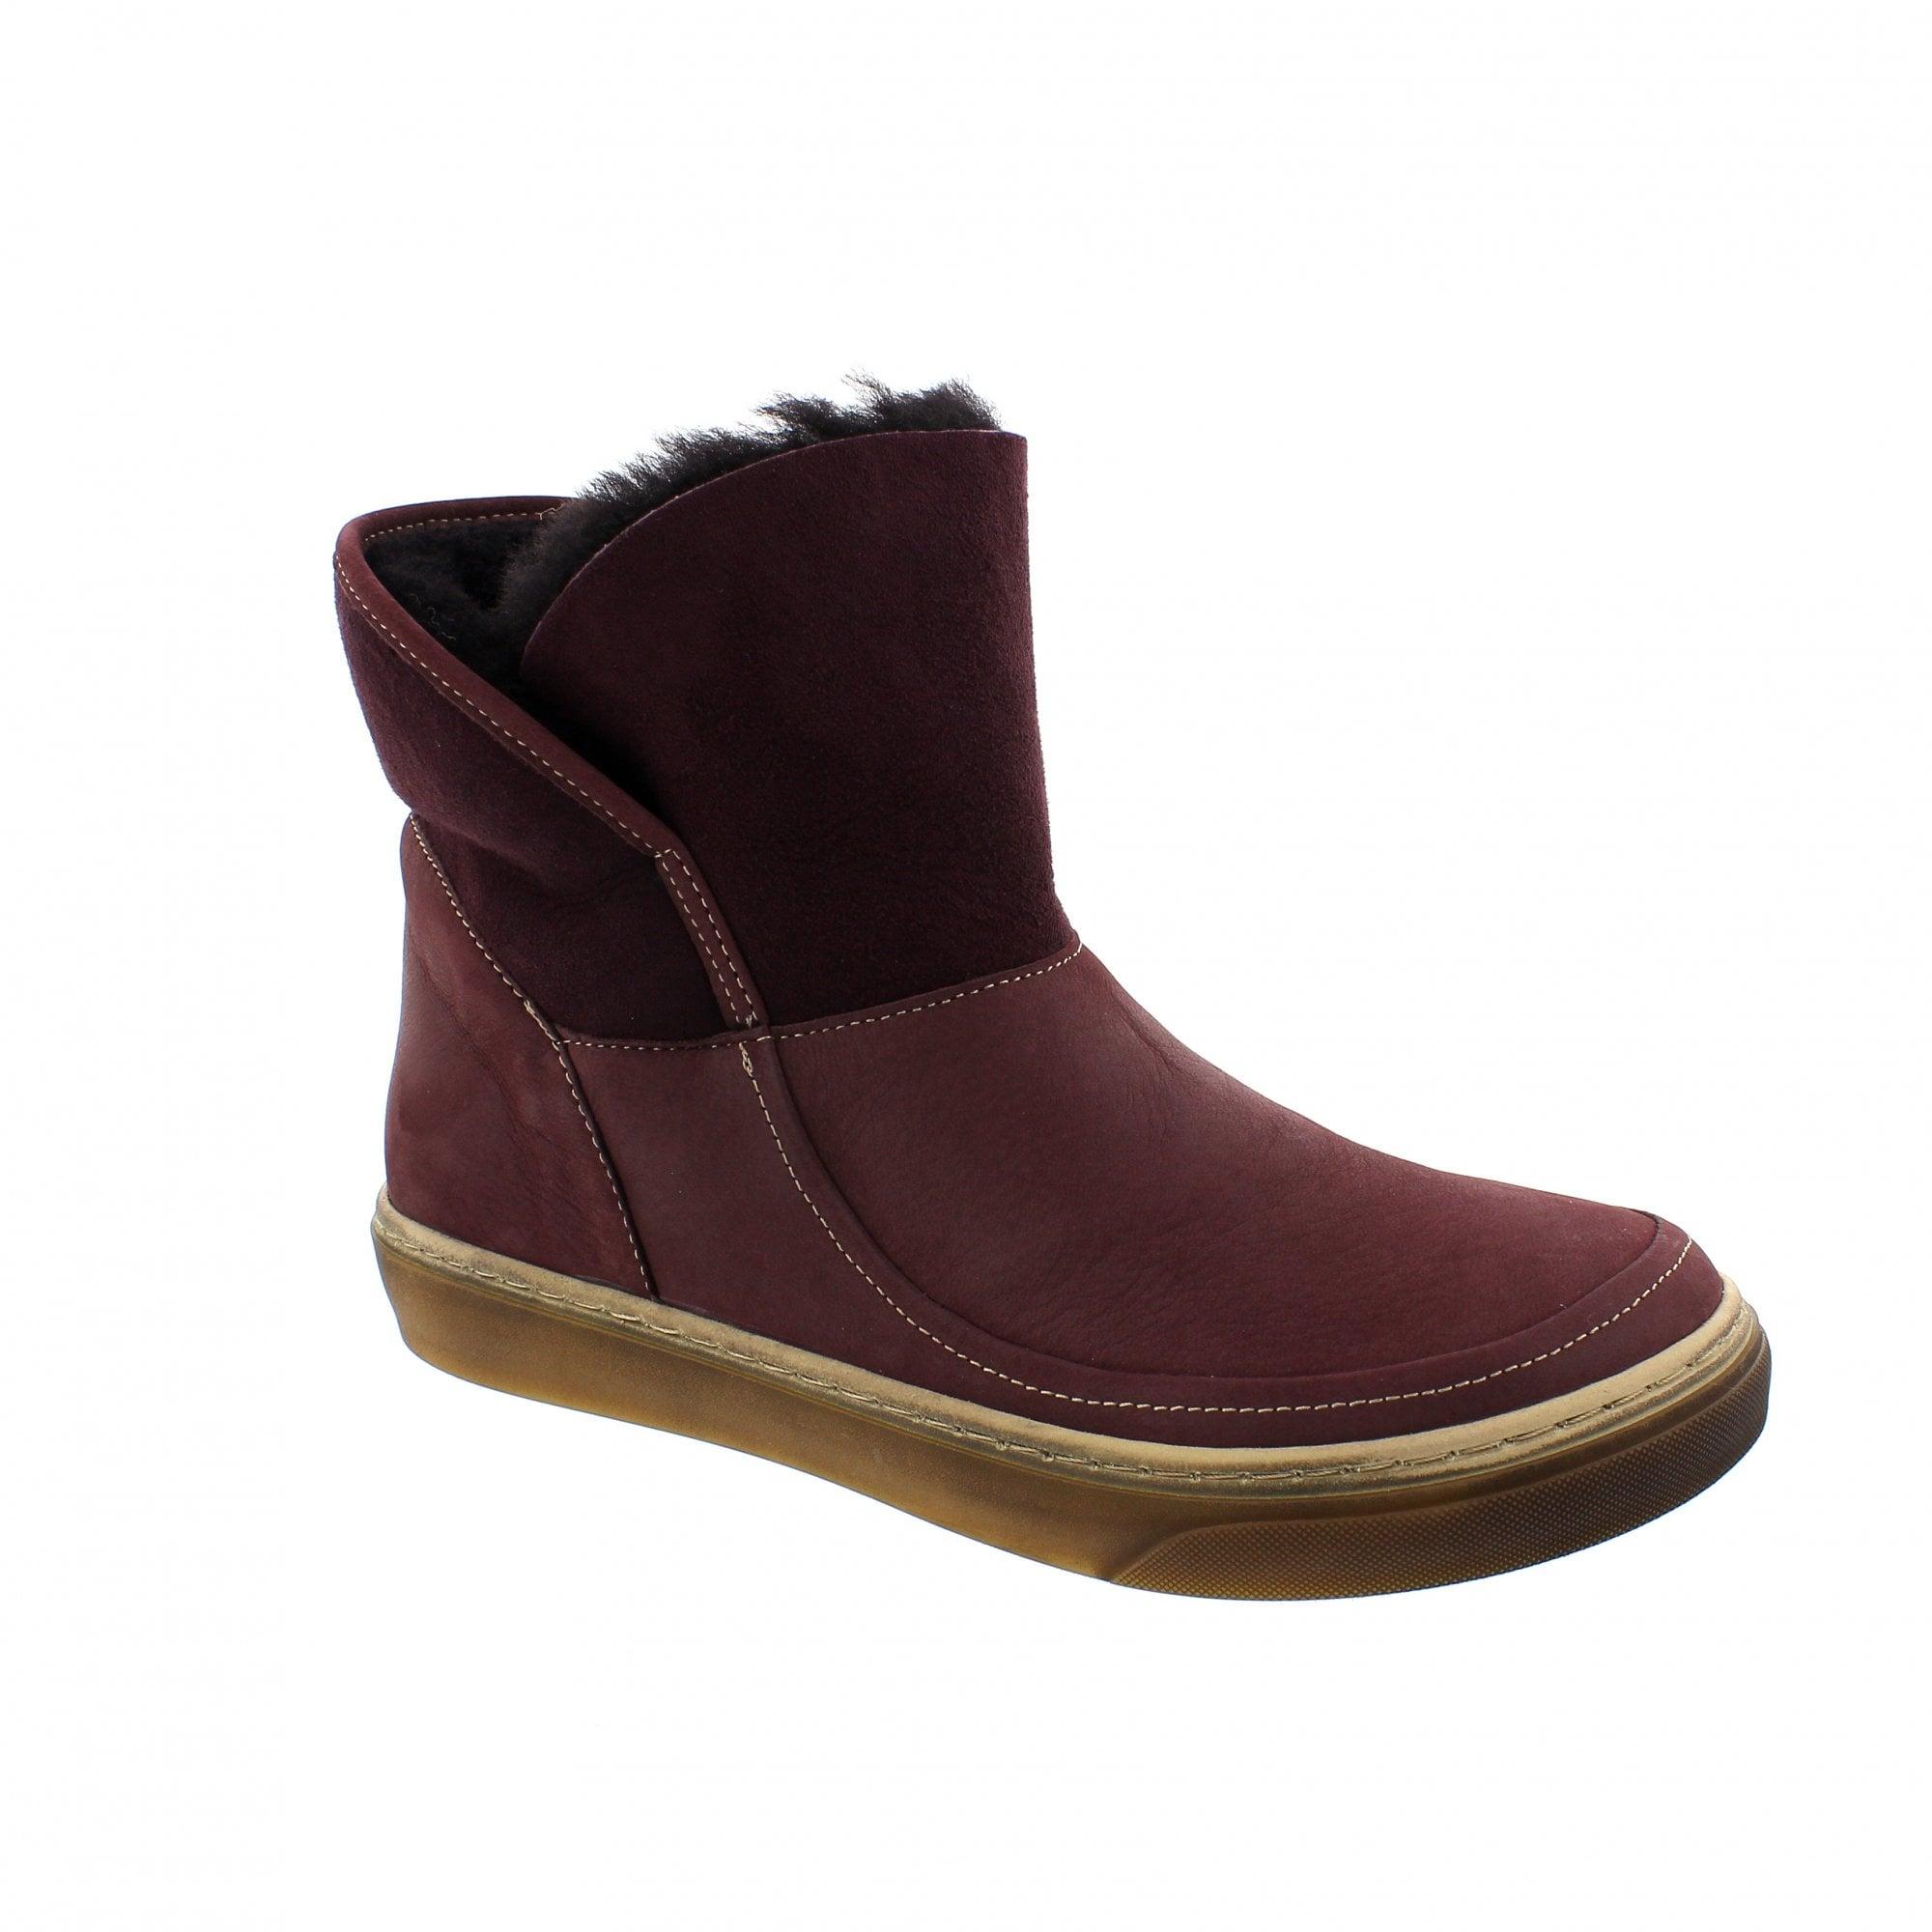 Josef Seibel Caro 23 Purple Womens Ankle Boots | Rogerson Shoes